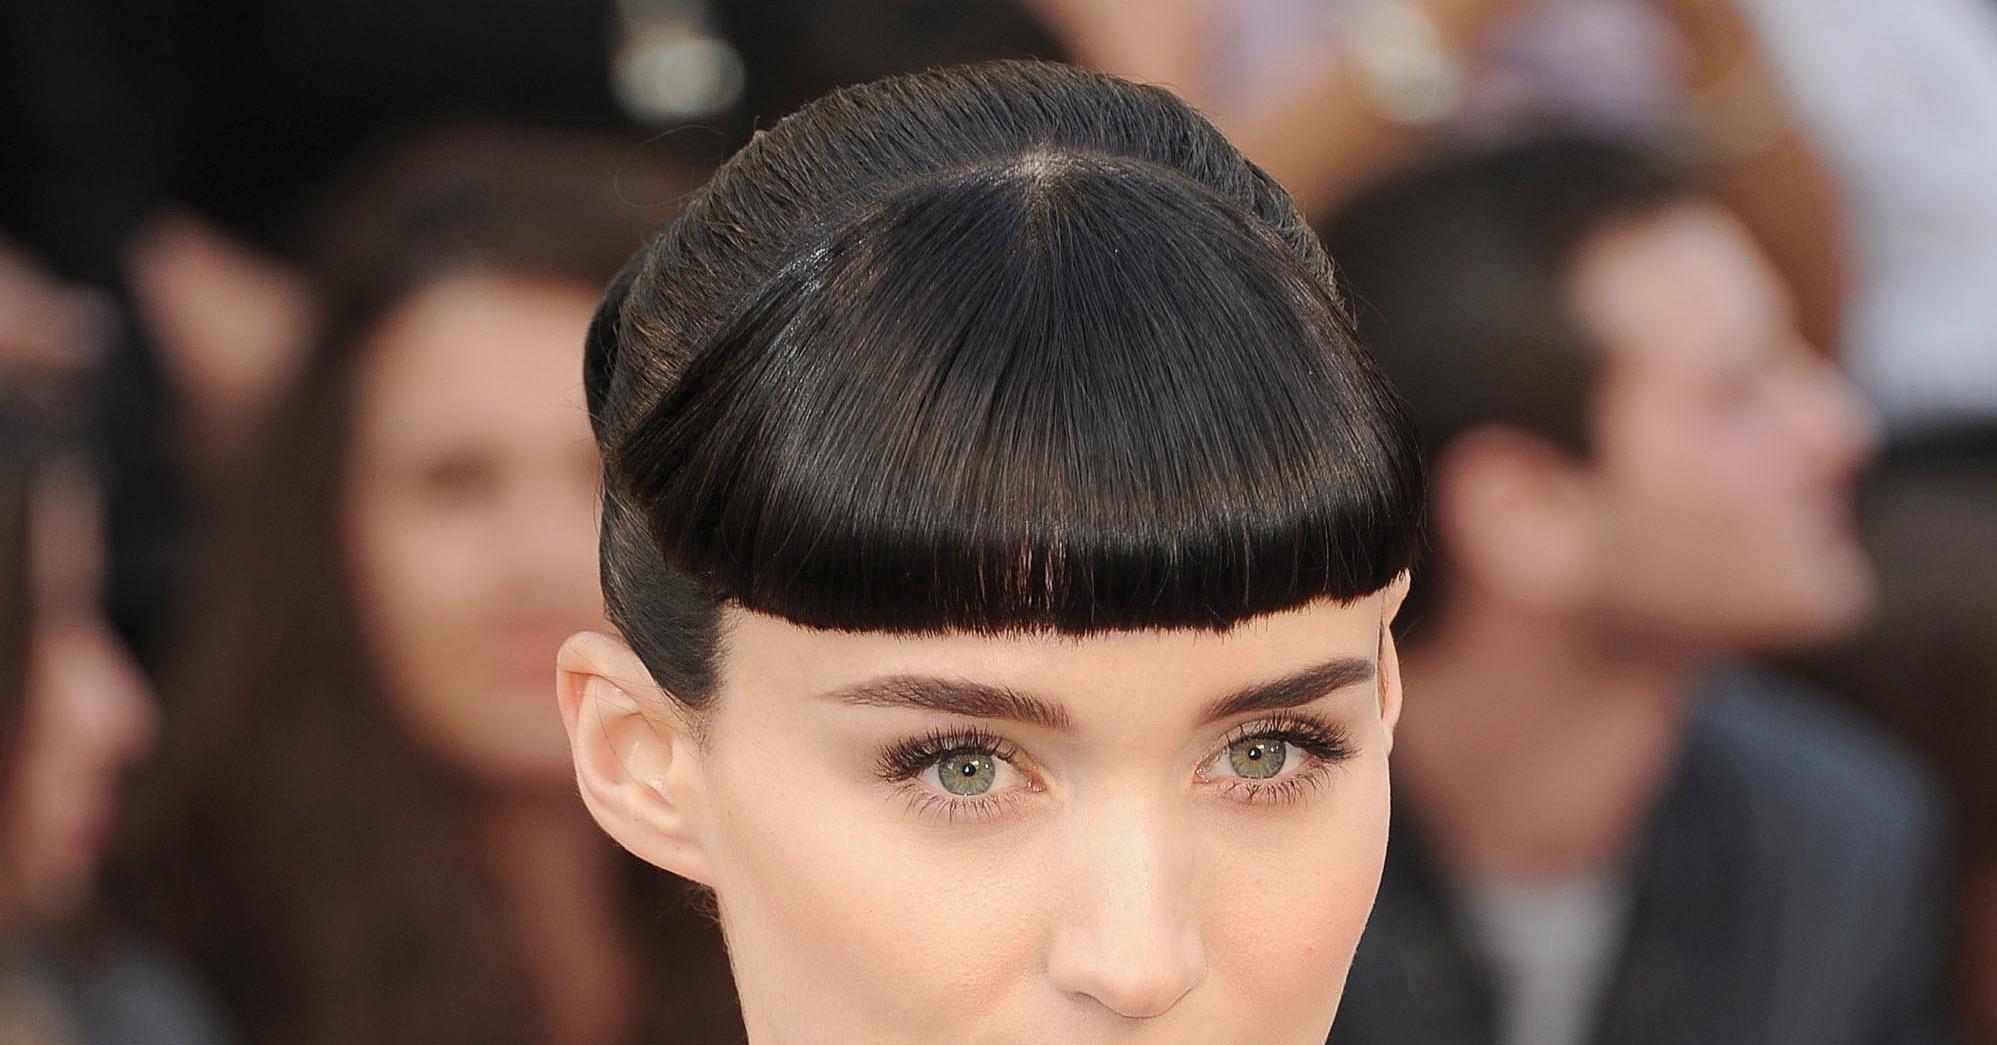 Oscars Best Dressed Red Carpet 2012 - Rooney Mara, Emma Stone ... Draya Facial Expressions